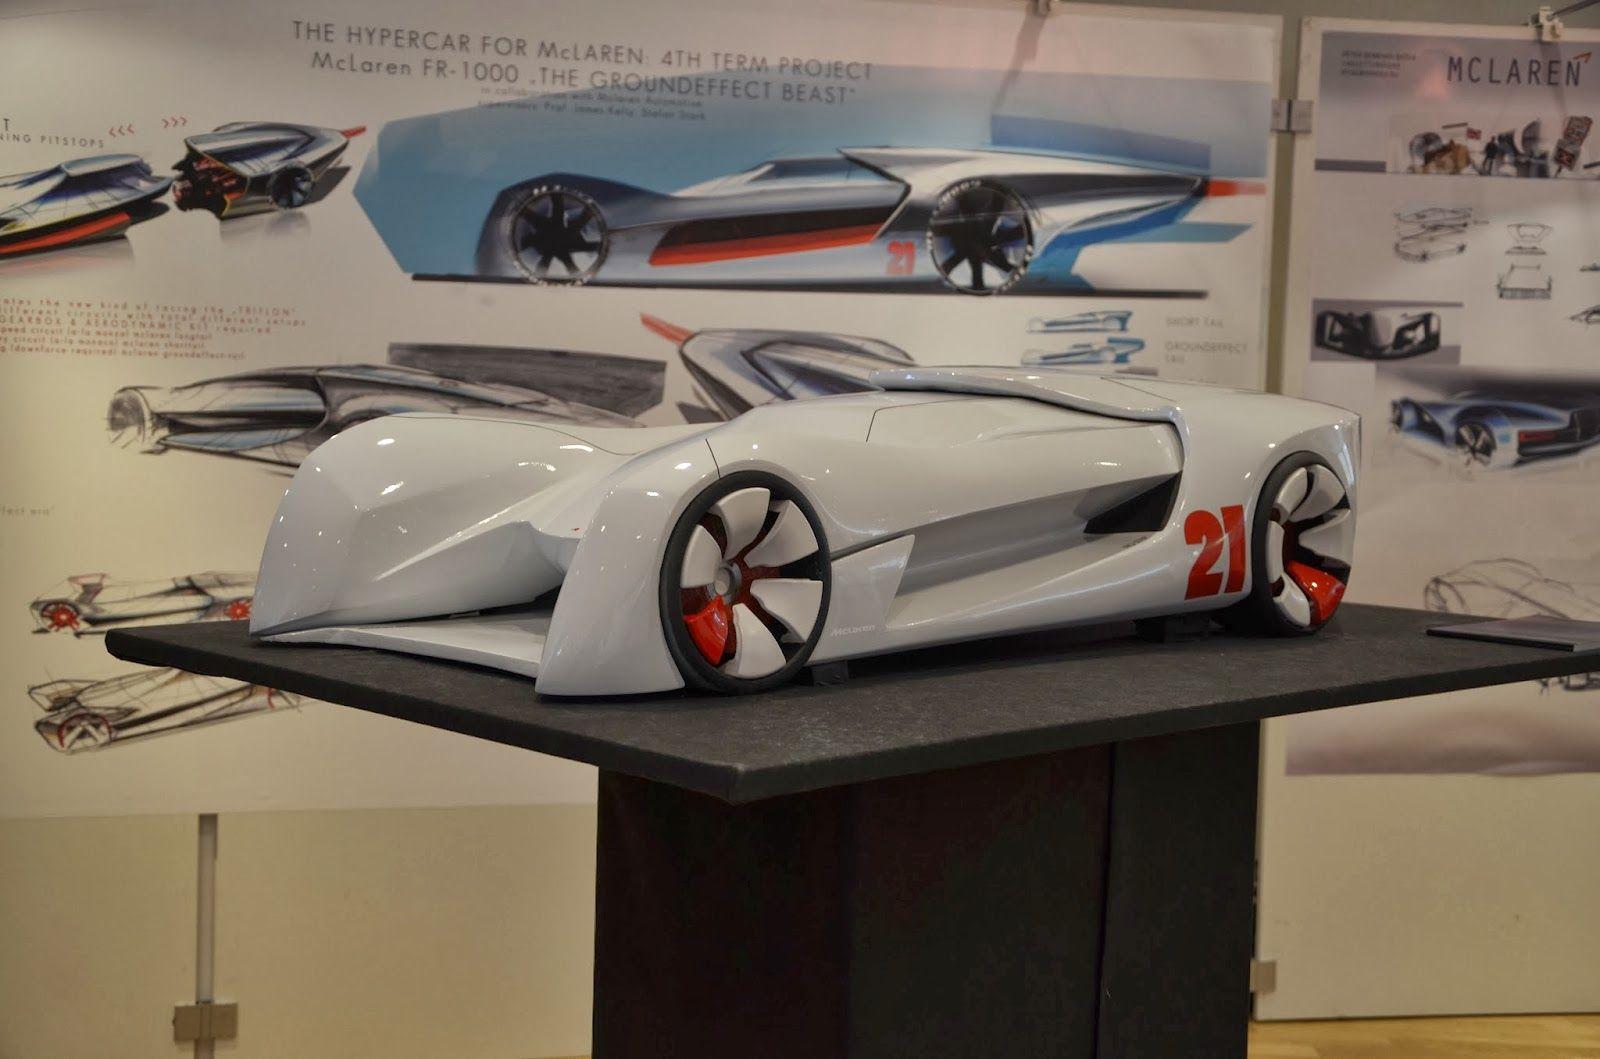 Sktchtrack 4th Term Project Racecar For Mclaren Hs Pforzheim Race Cars Mclaren Concept Cars